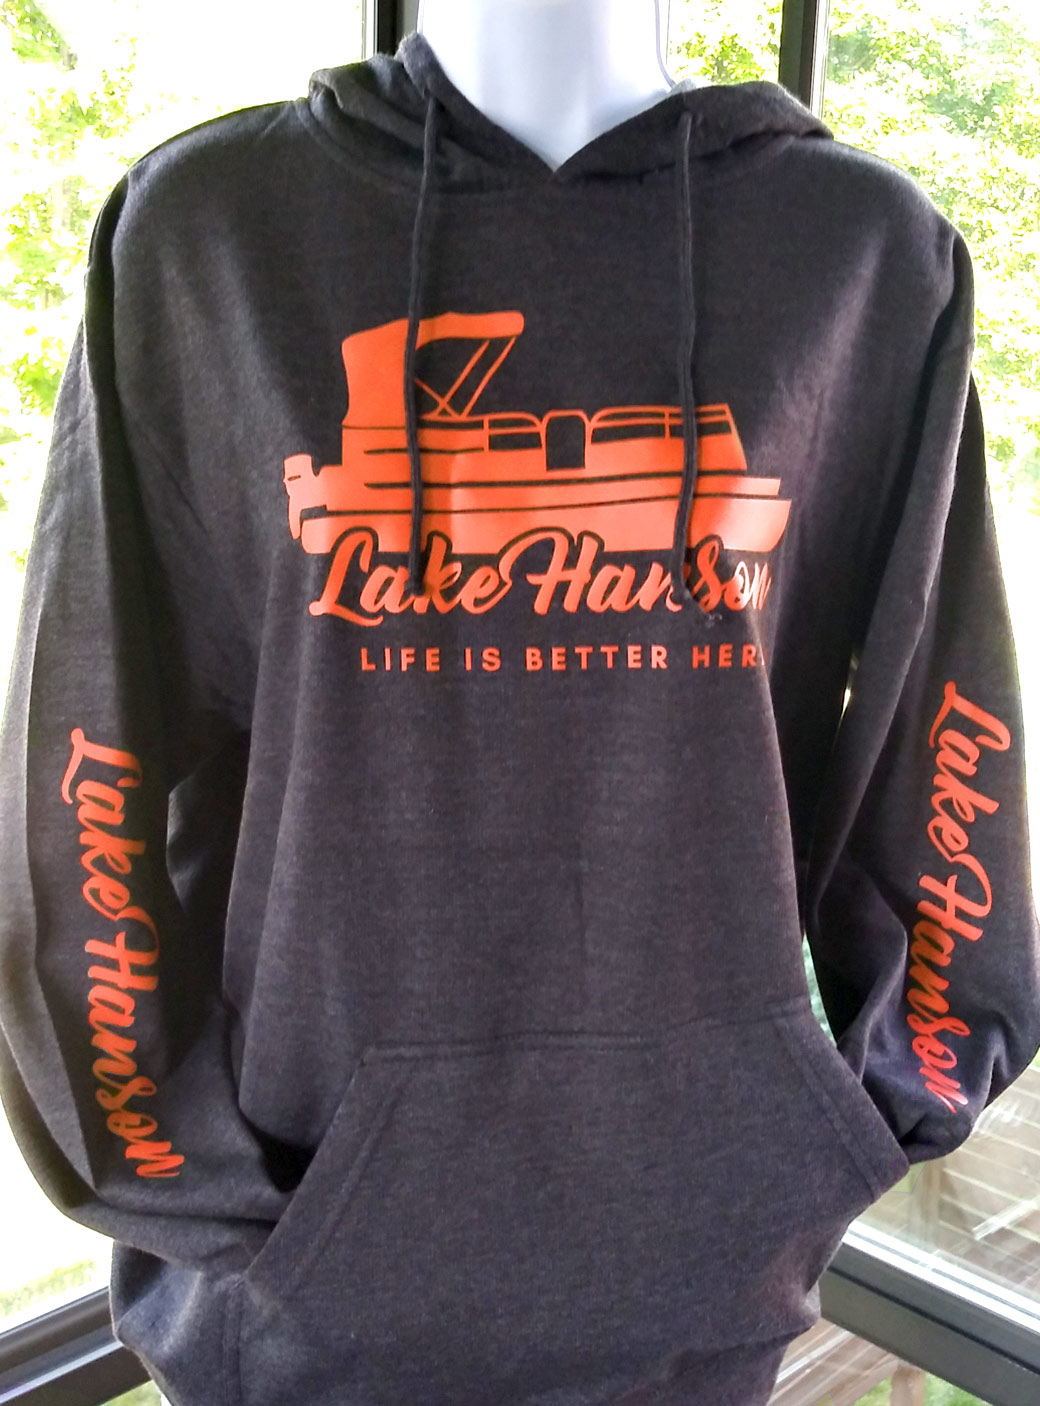 Lake Hanson Fleece Sweatshirt - Hoodie, Pullover charcoal - orange